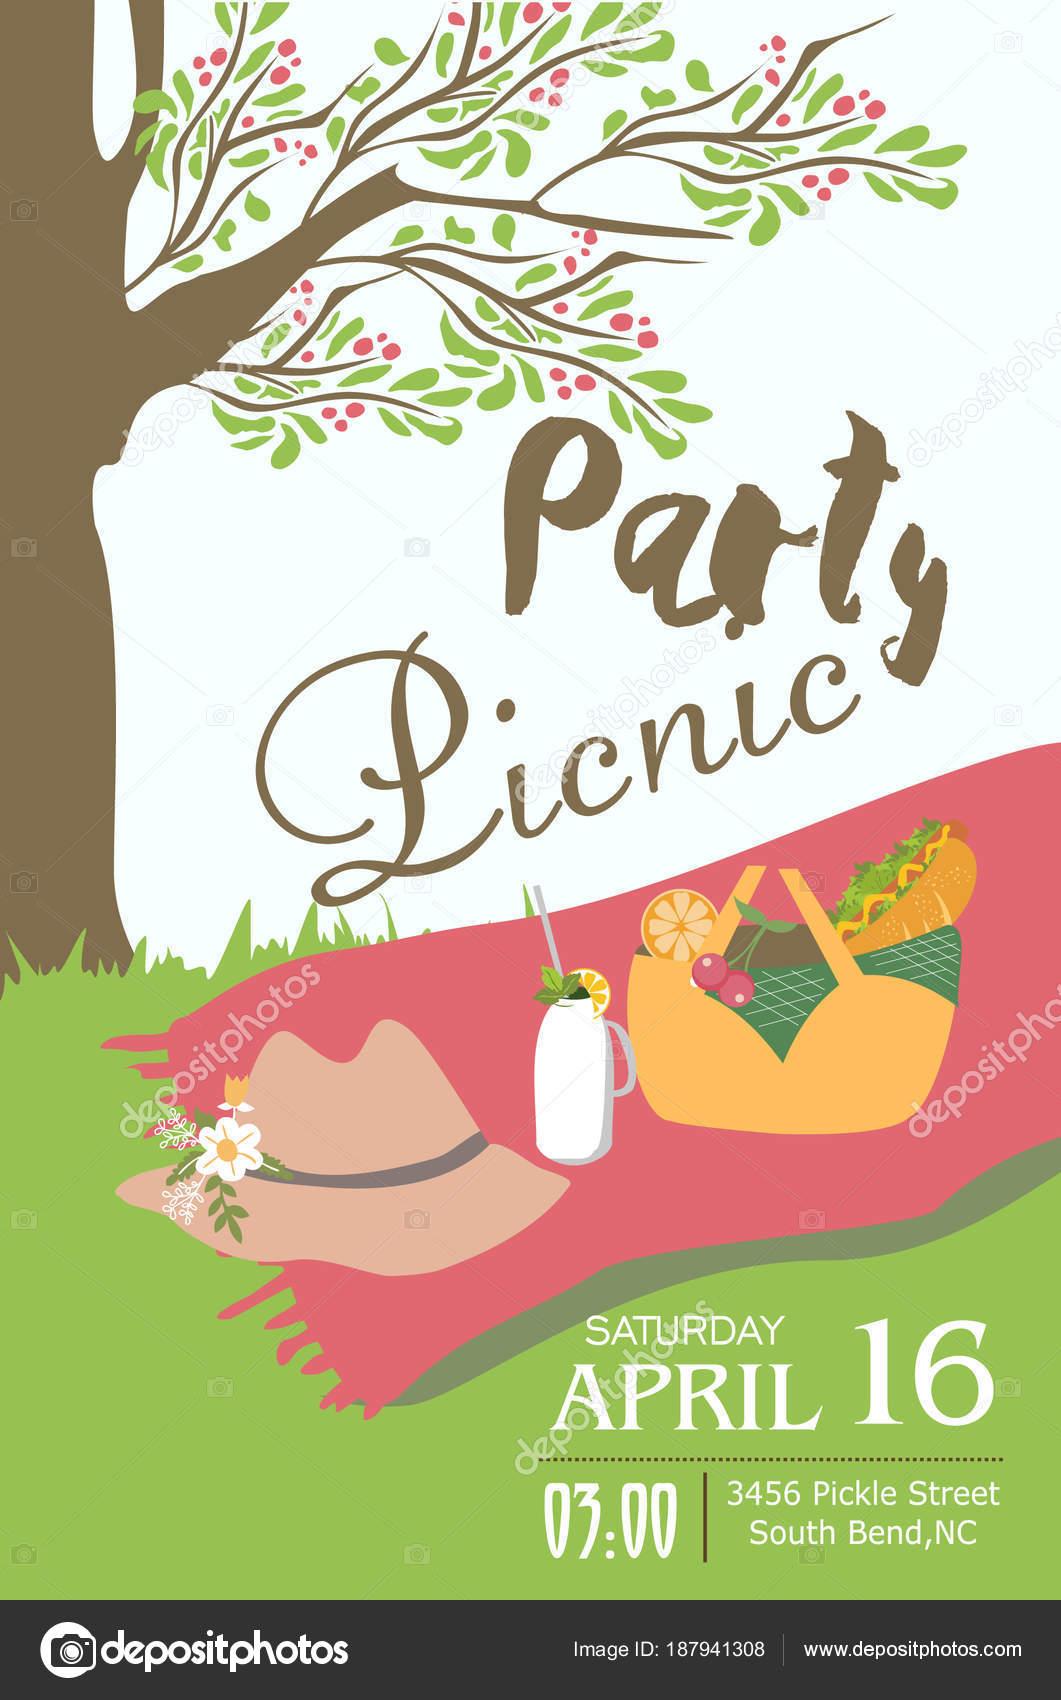 Picnic party invitation card stock vector sweetcheeks 187941308 picnic party invitation card stock vector stopboris Images